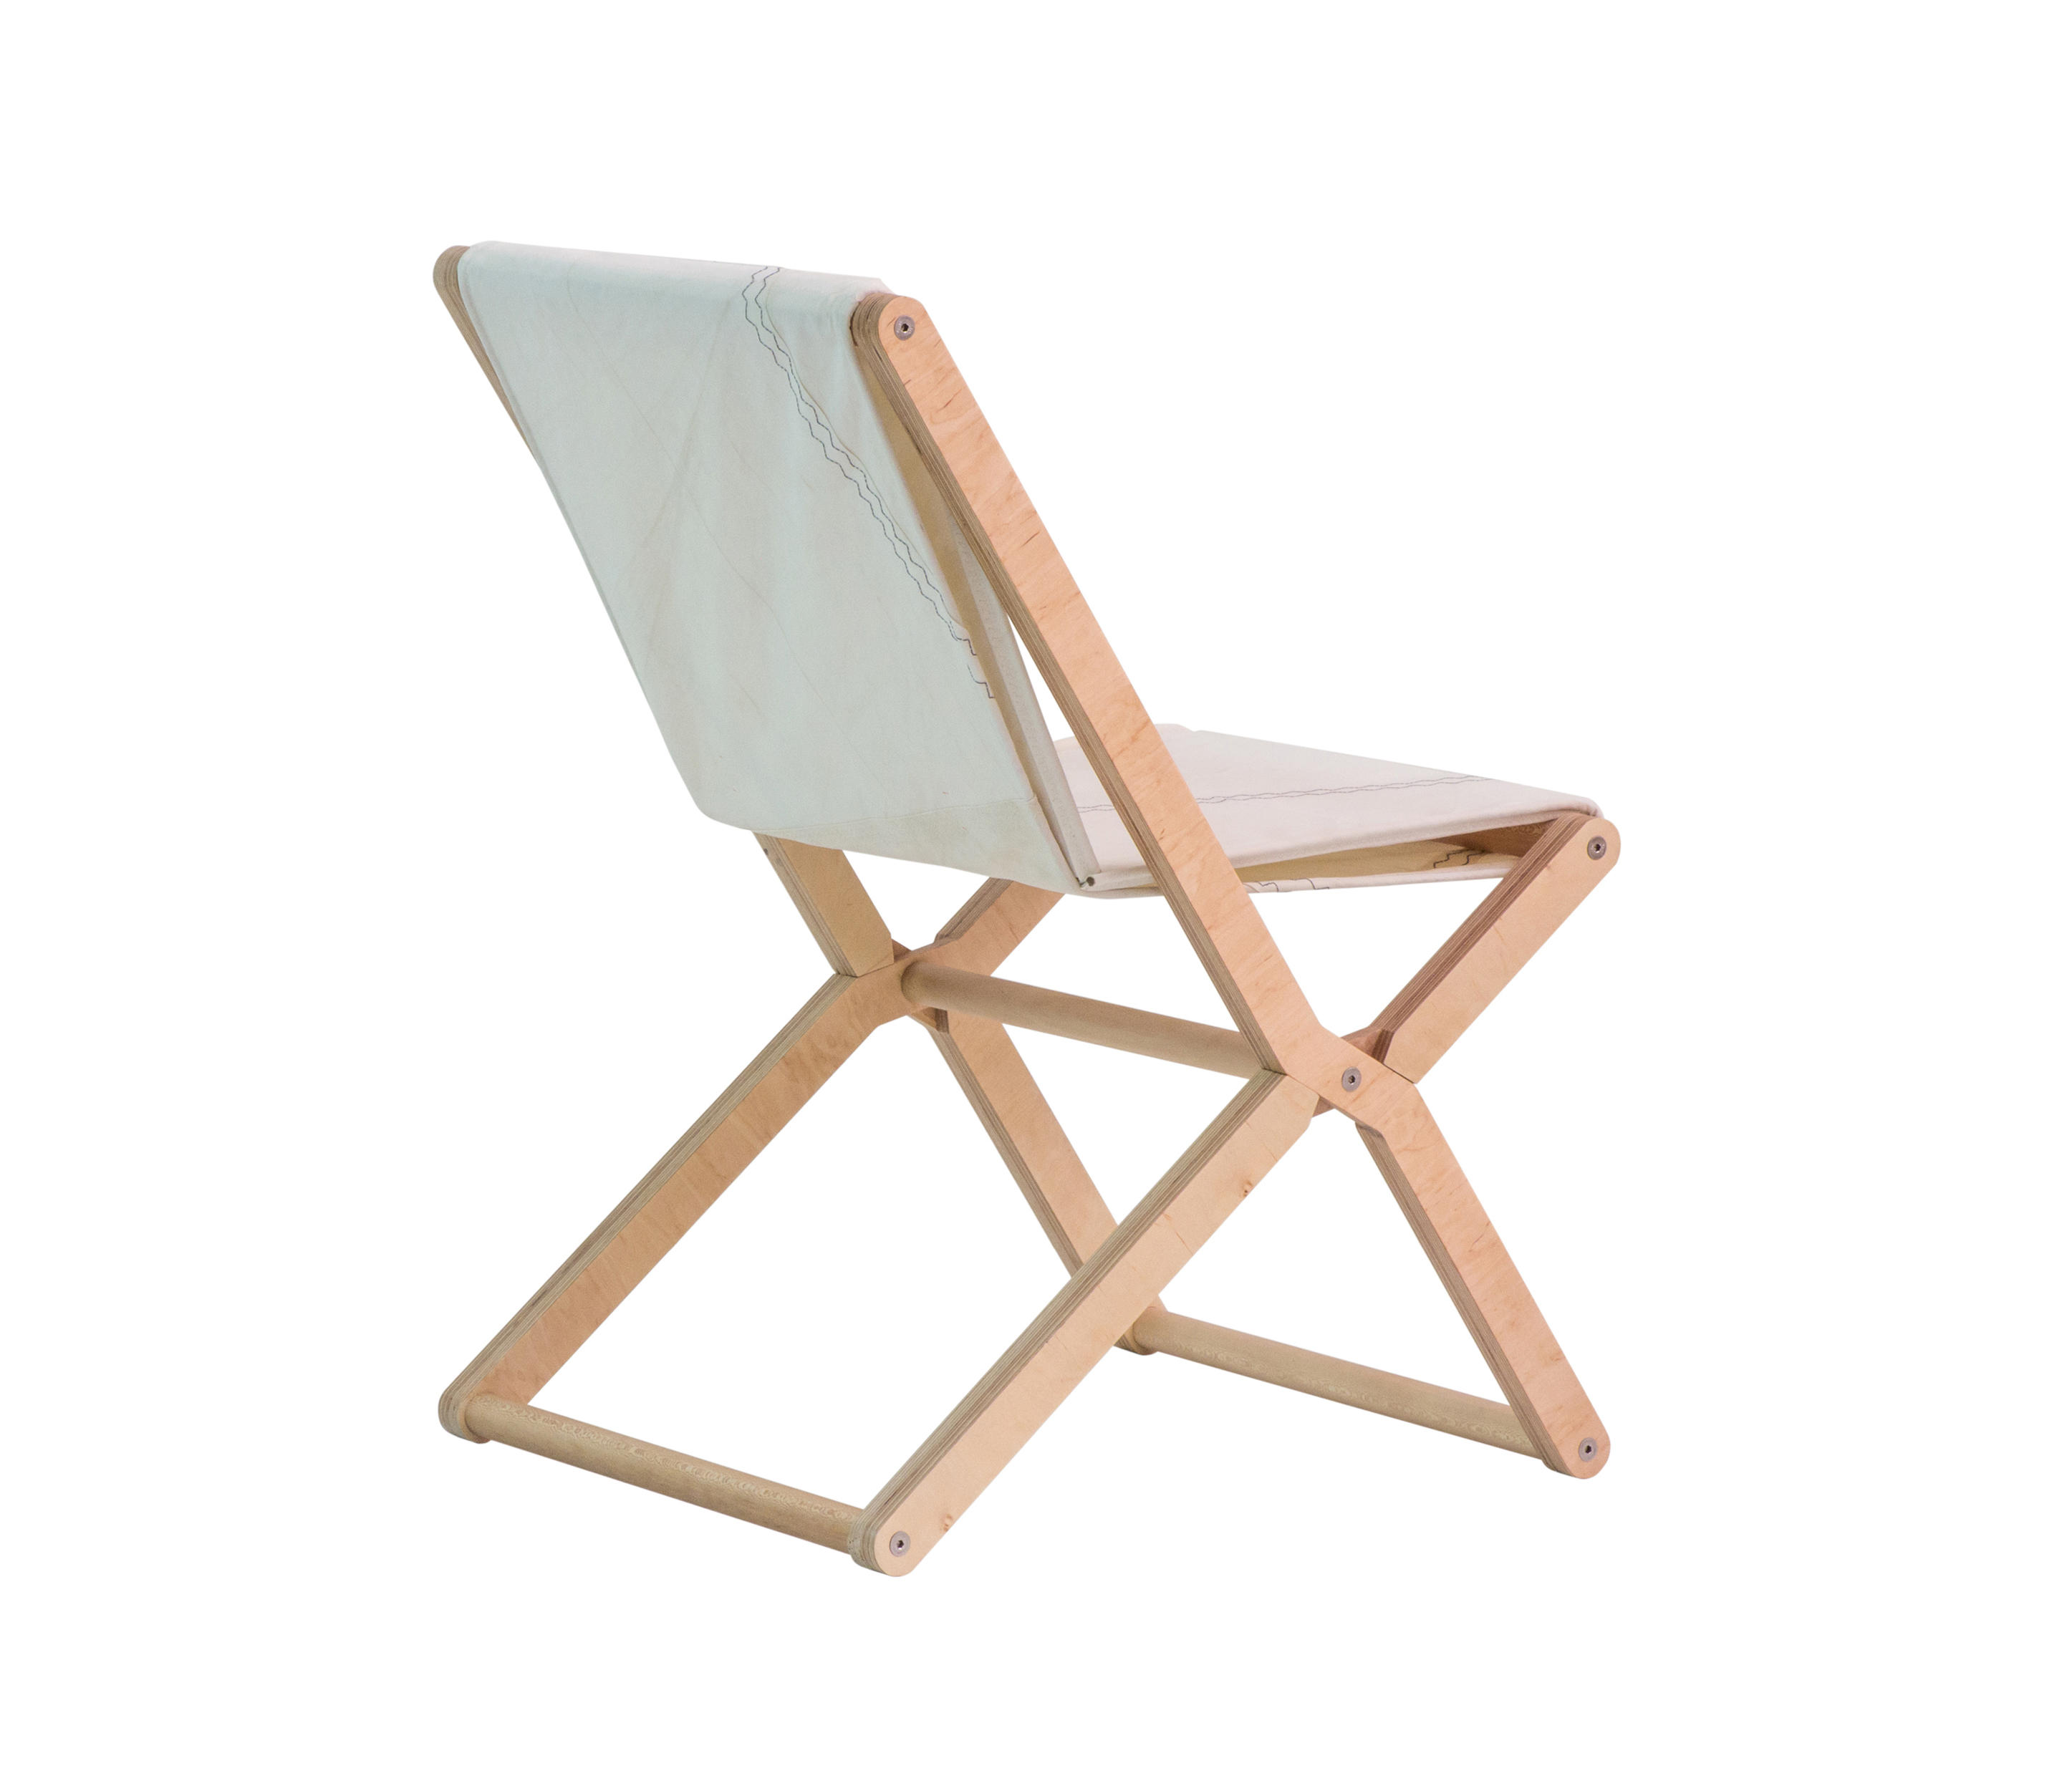 CREW CHAIR Garden chairs from DVELAS